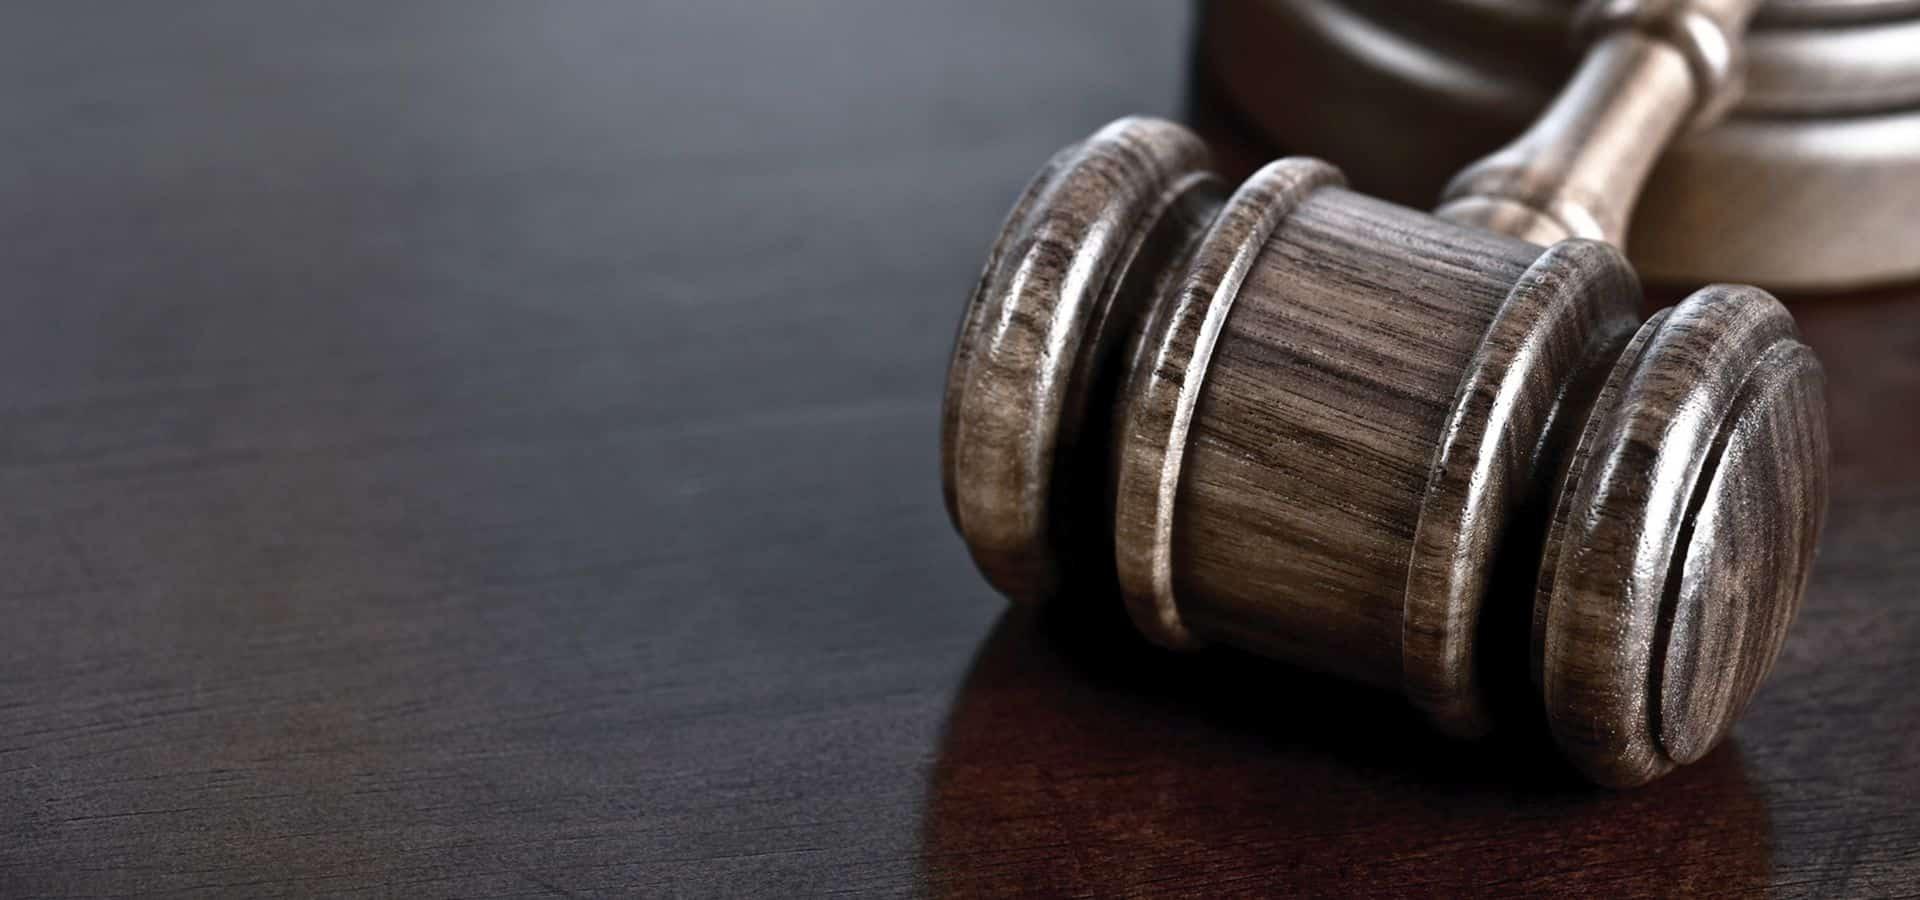 Turkish Litigation & Trial Lawyers